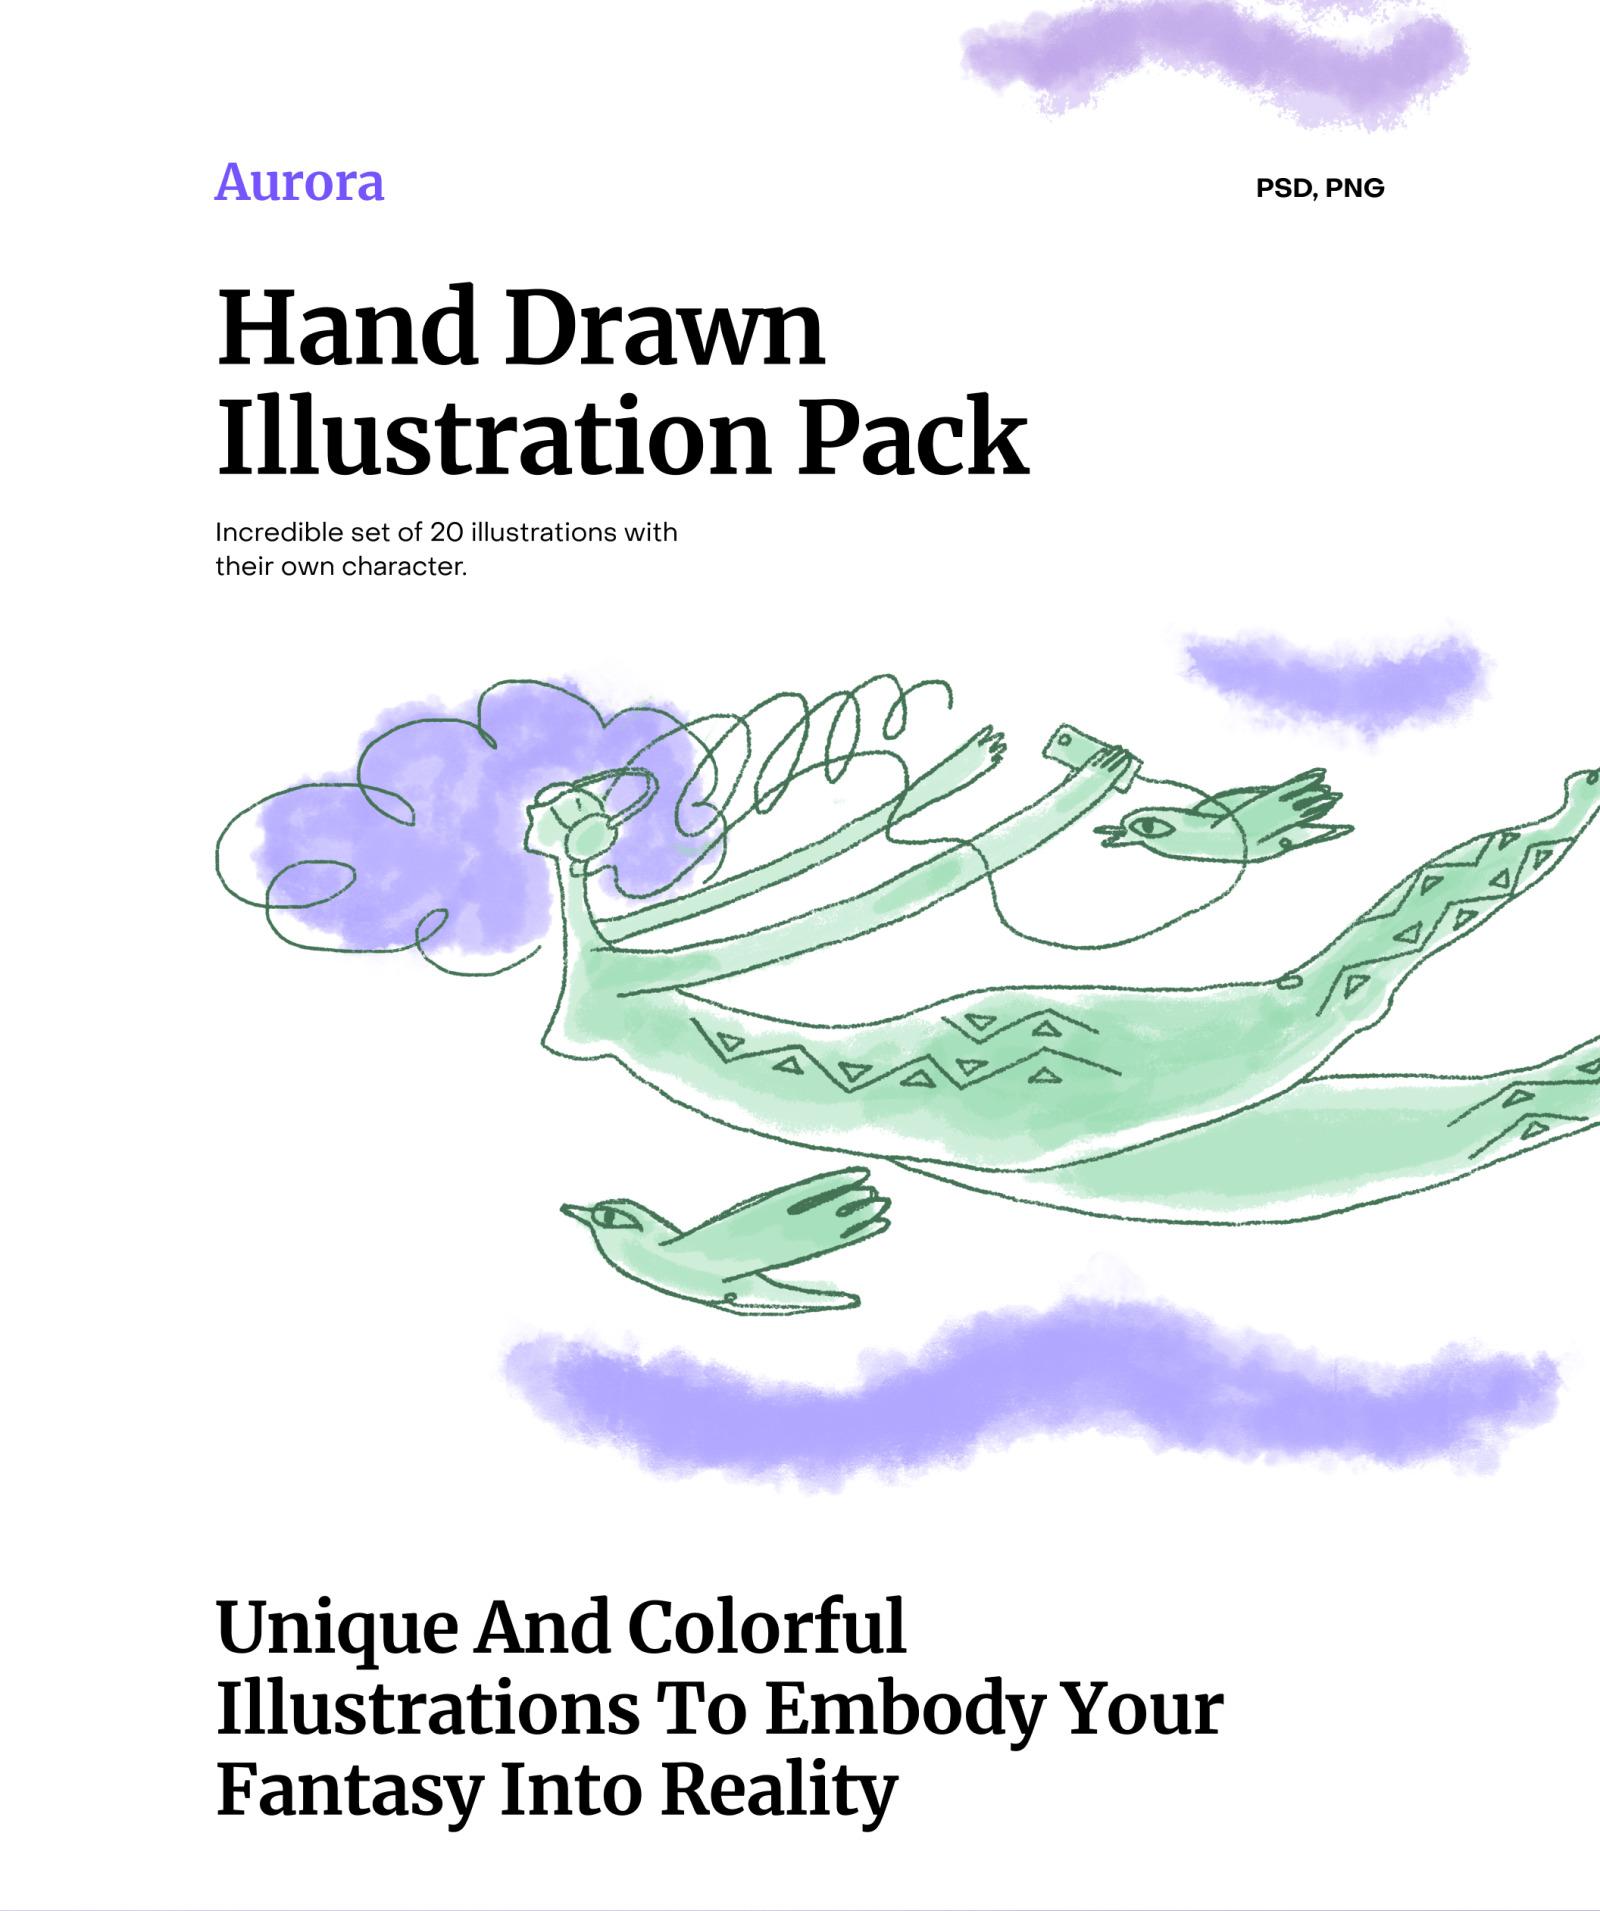 Aurora Illustrations